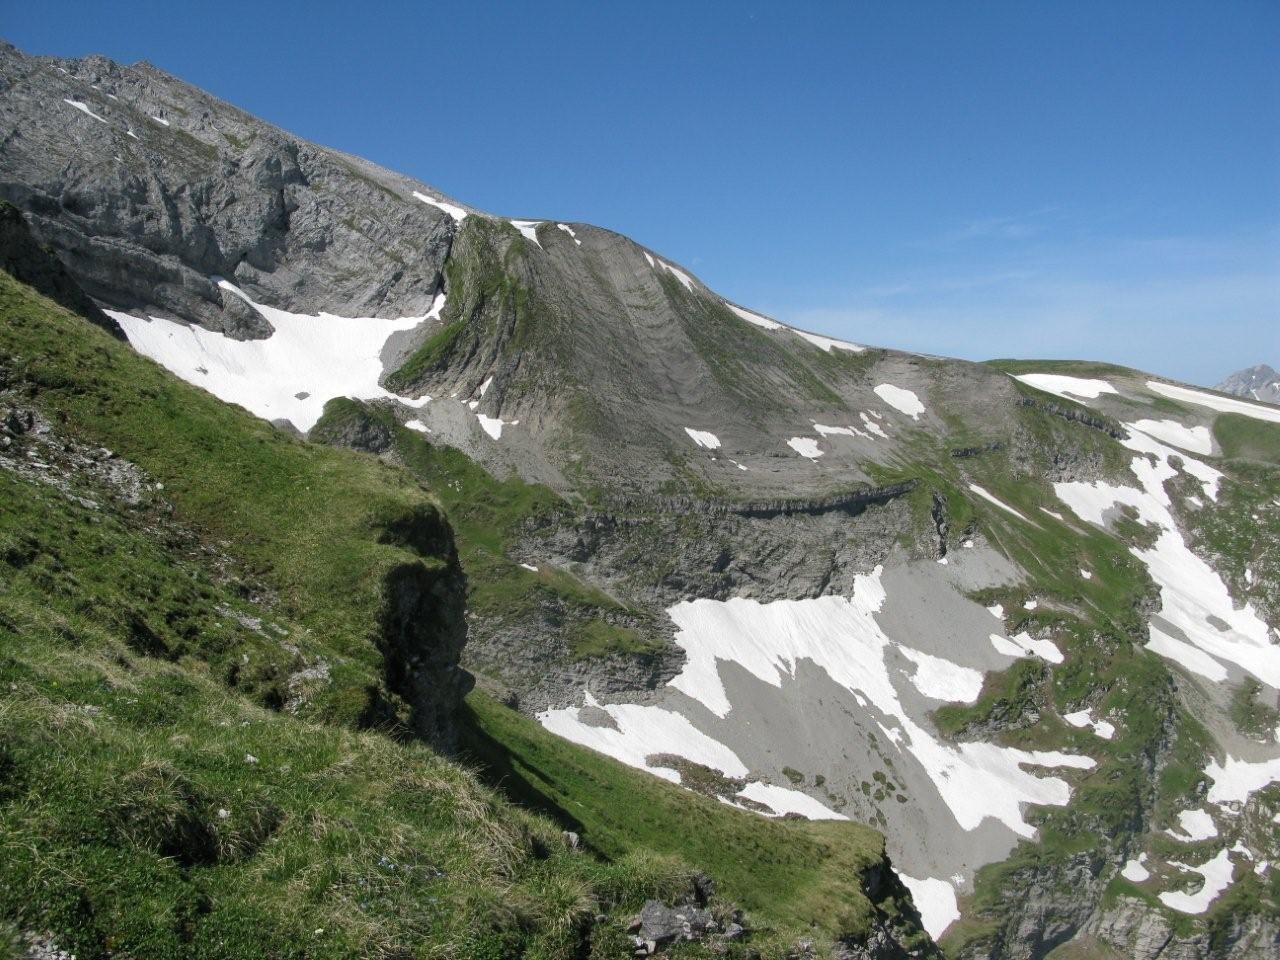 sommet 2478 m. areu